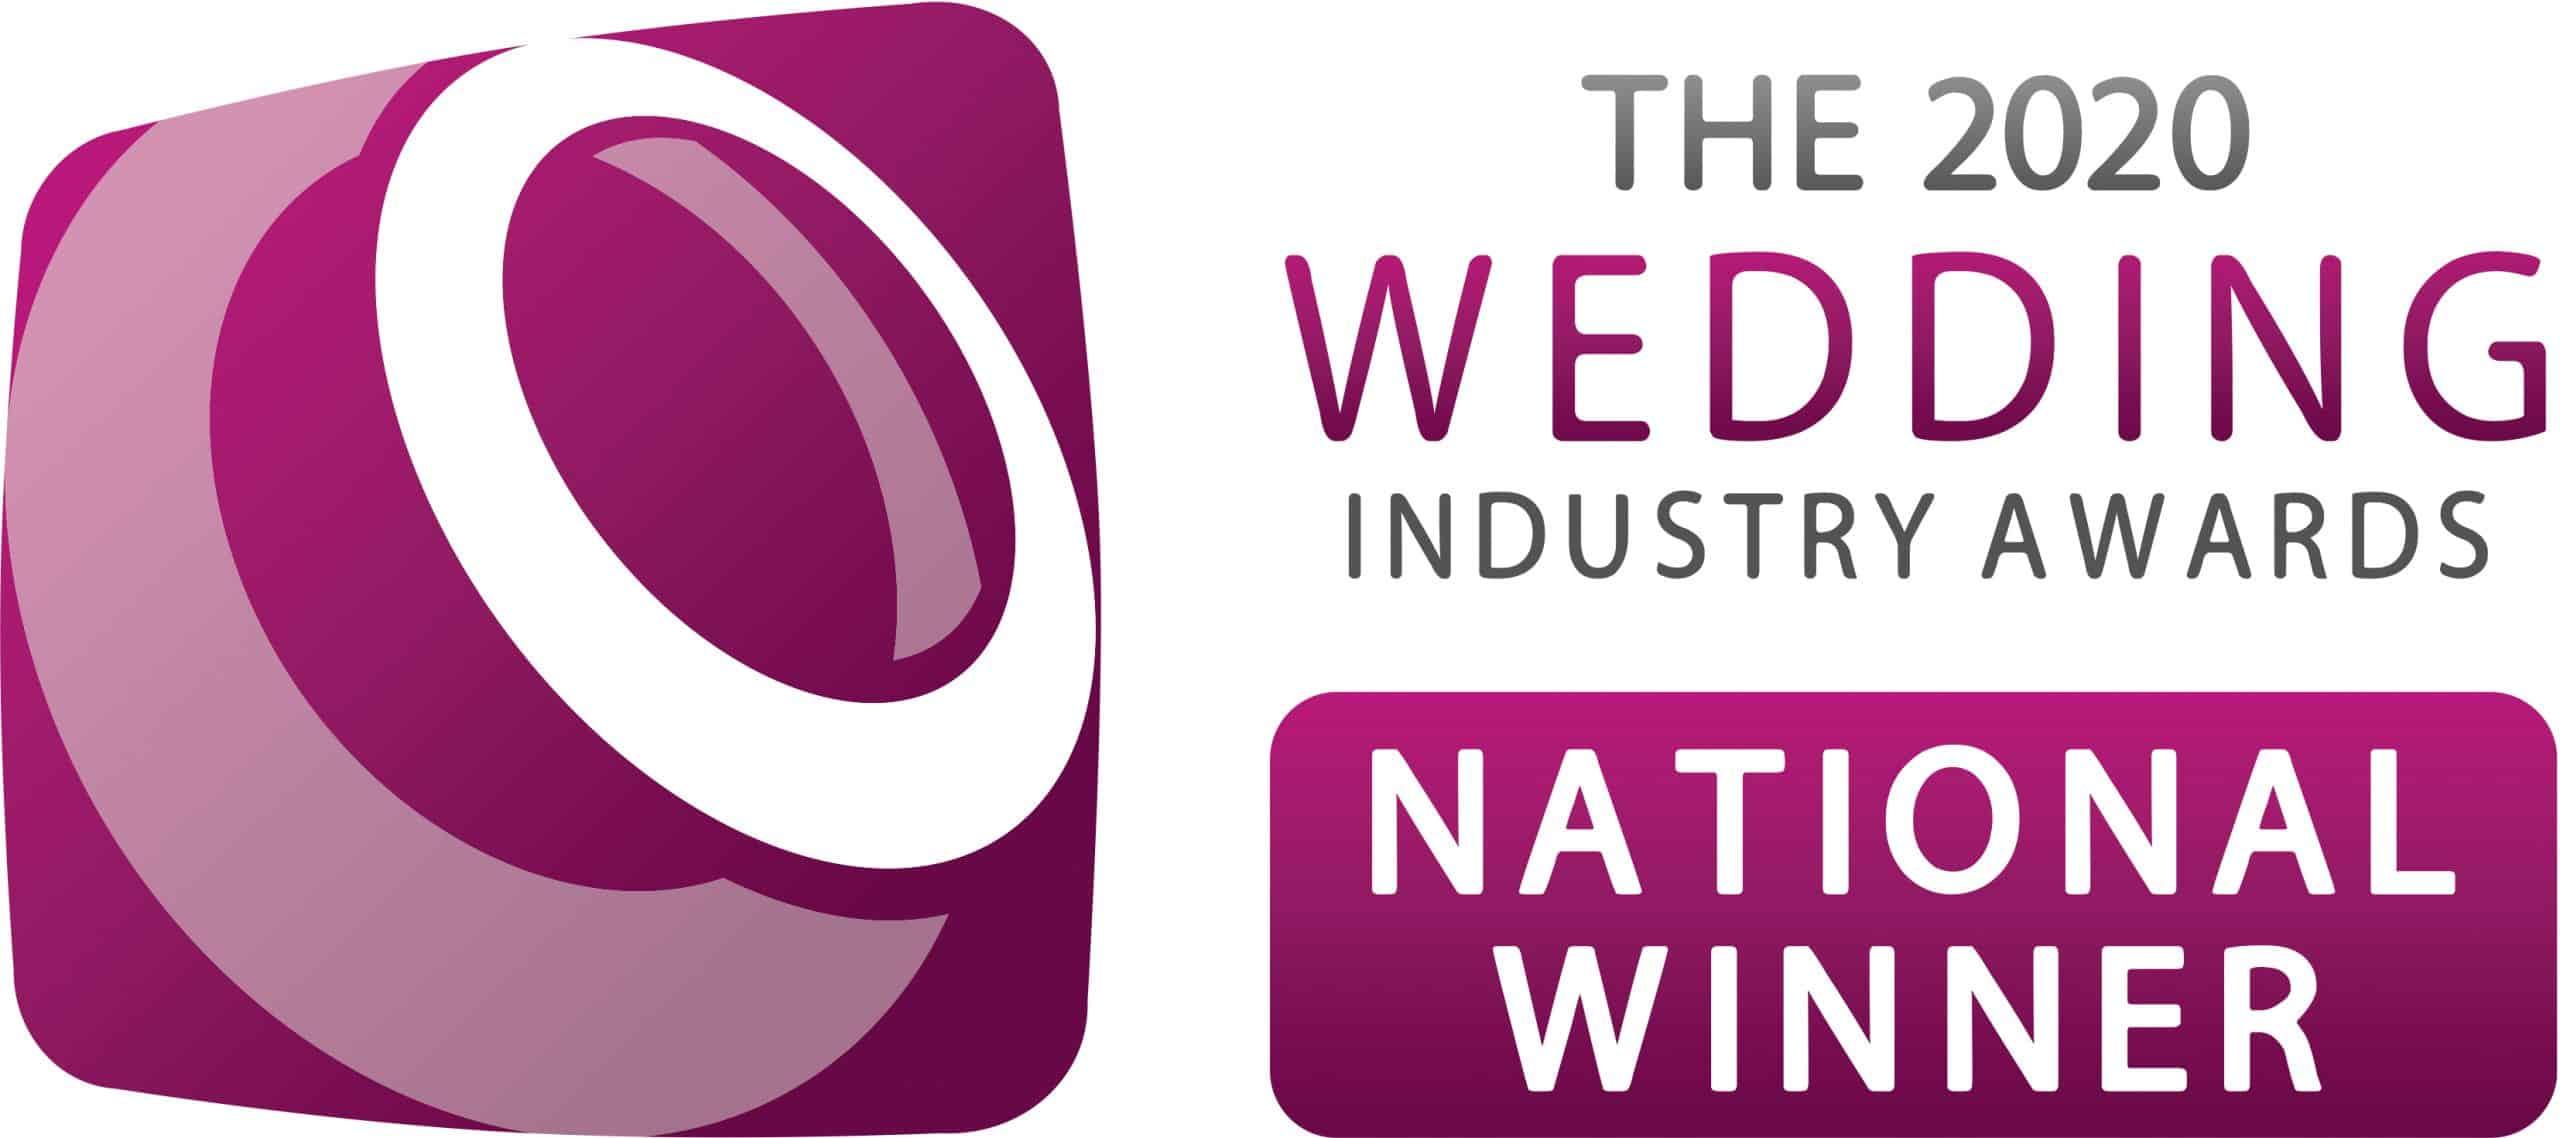 The 2020 Wedding Industry Awards National Winner